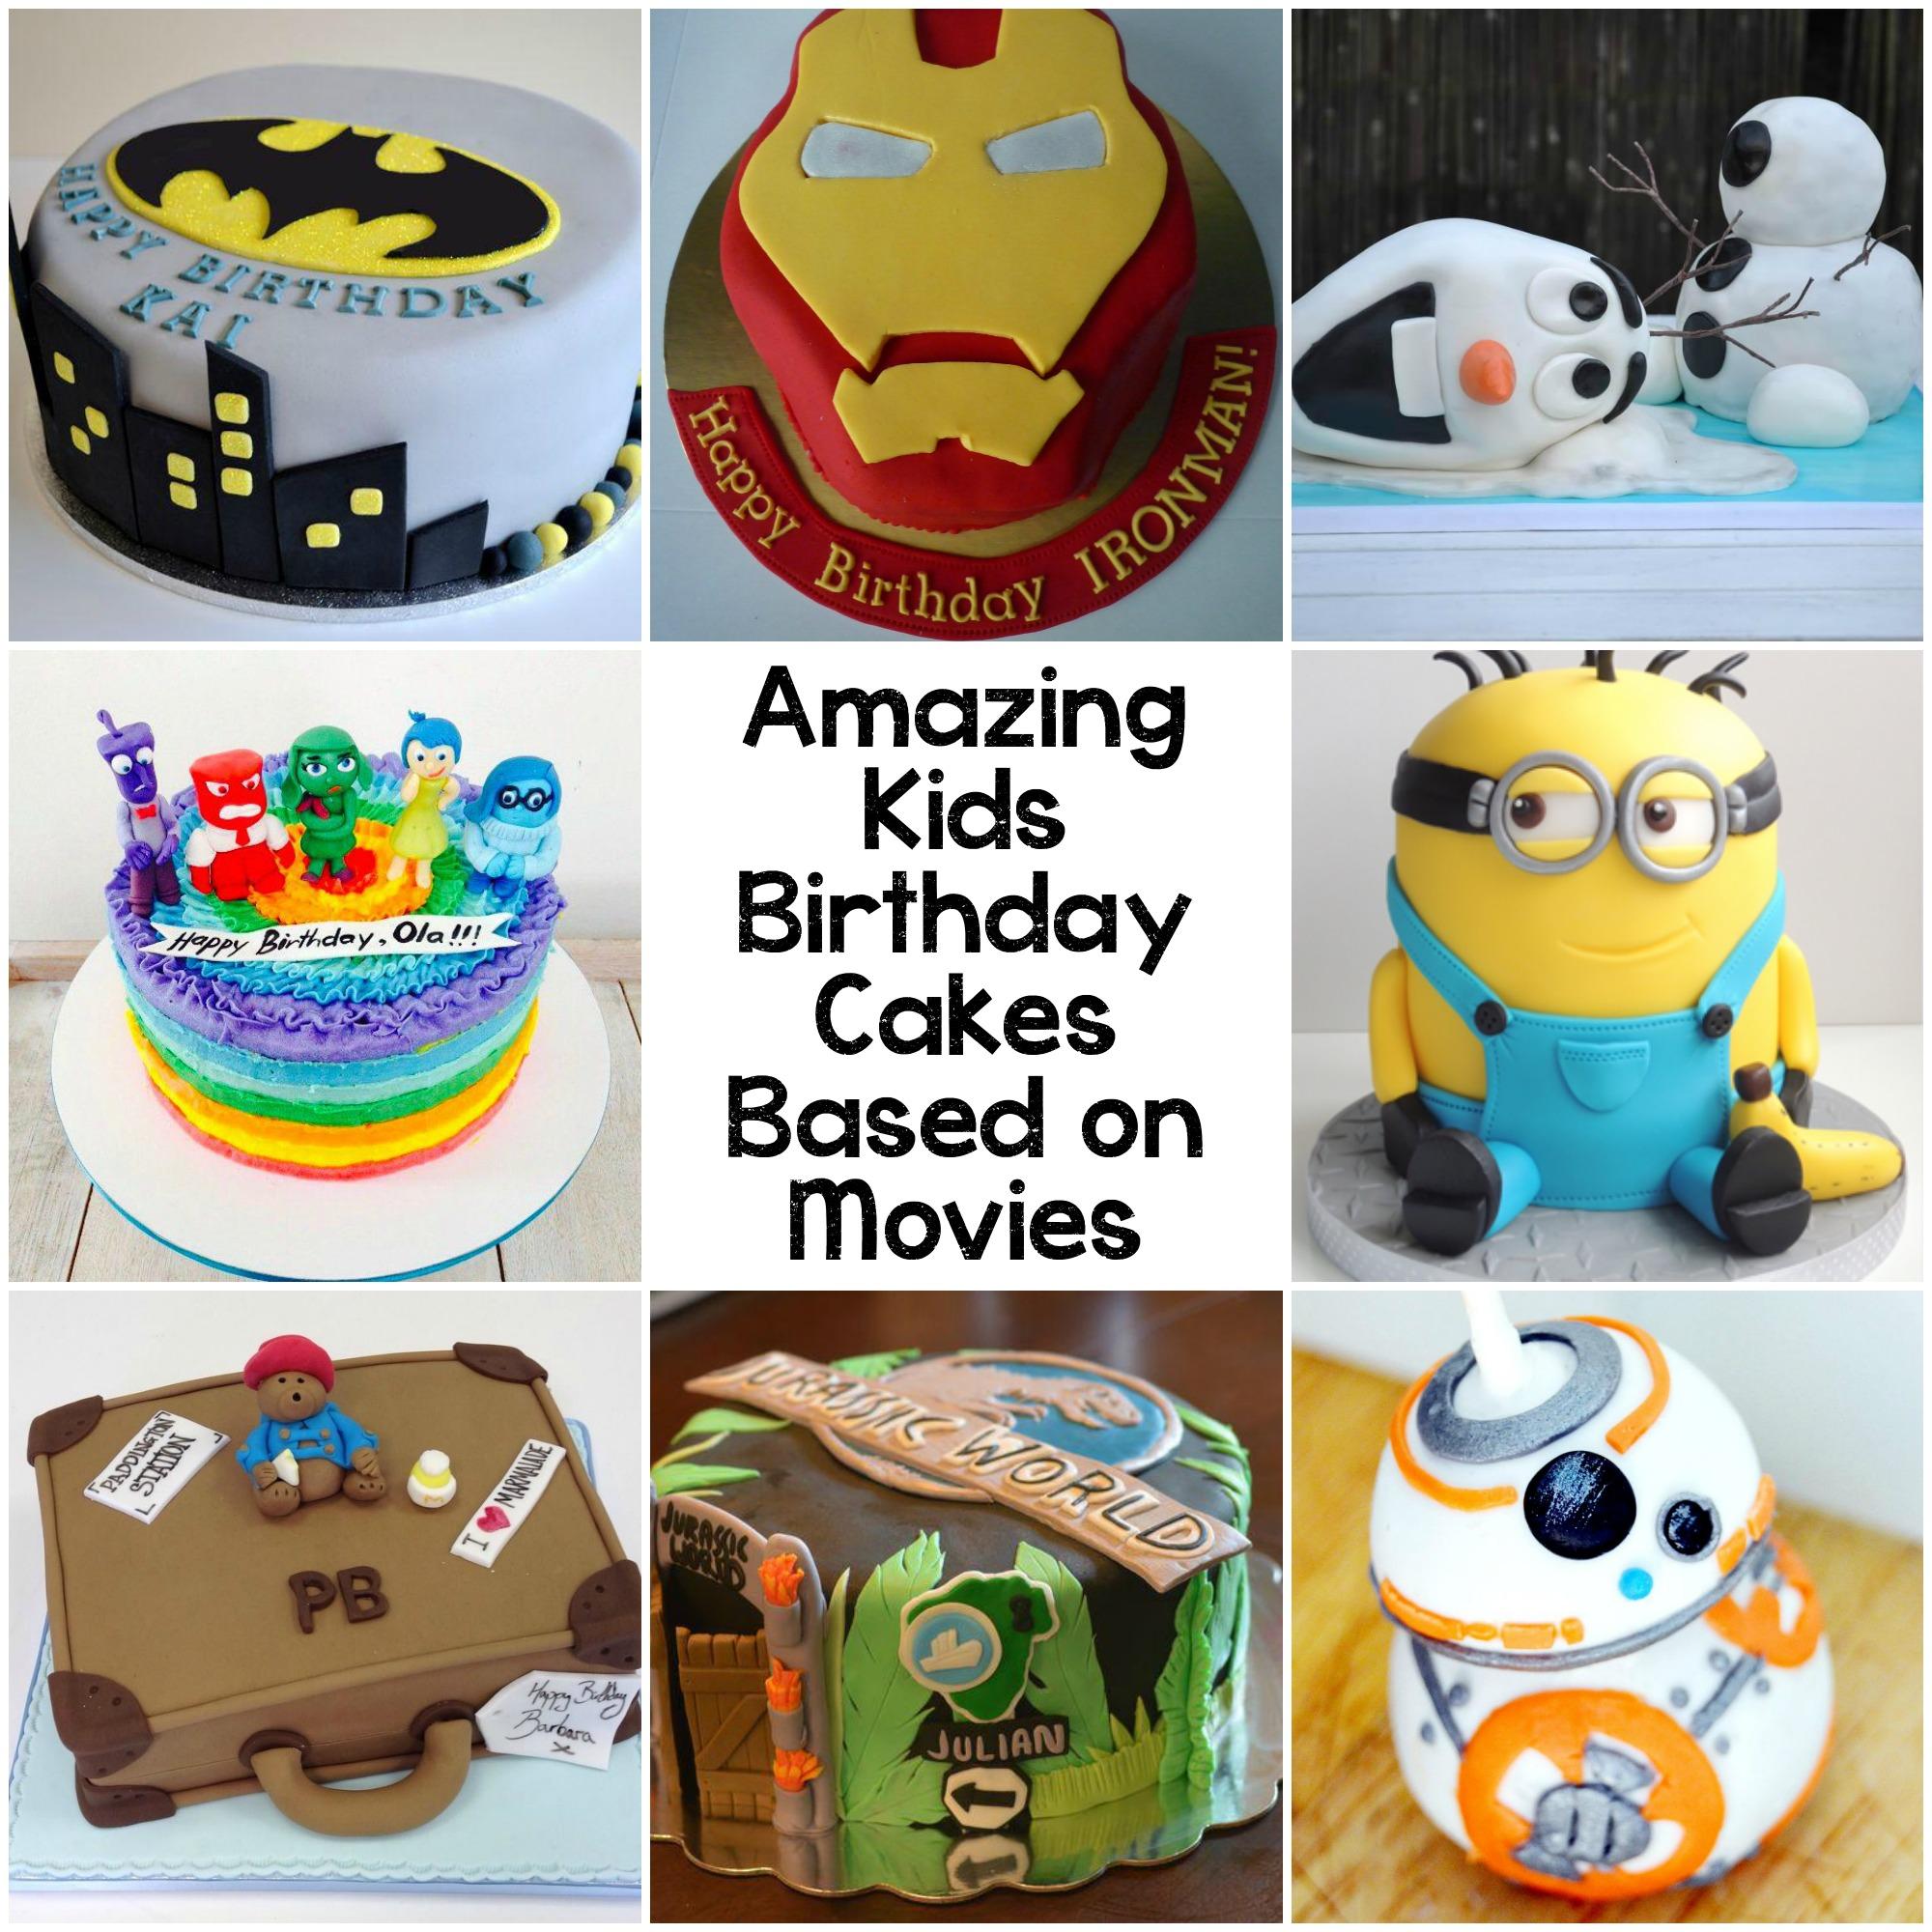 Fantastic 10 Amazing Kids Birthday Cakes Based On Movies In The Playroom Funny Birthday Cards Online Kookostrdamsfinfo